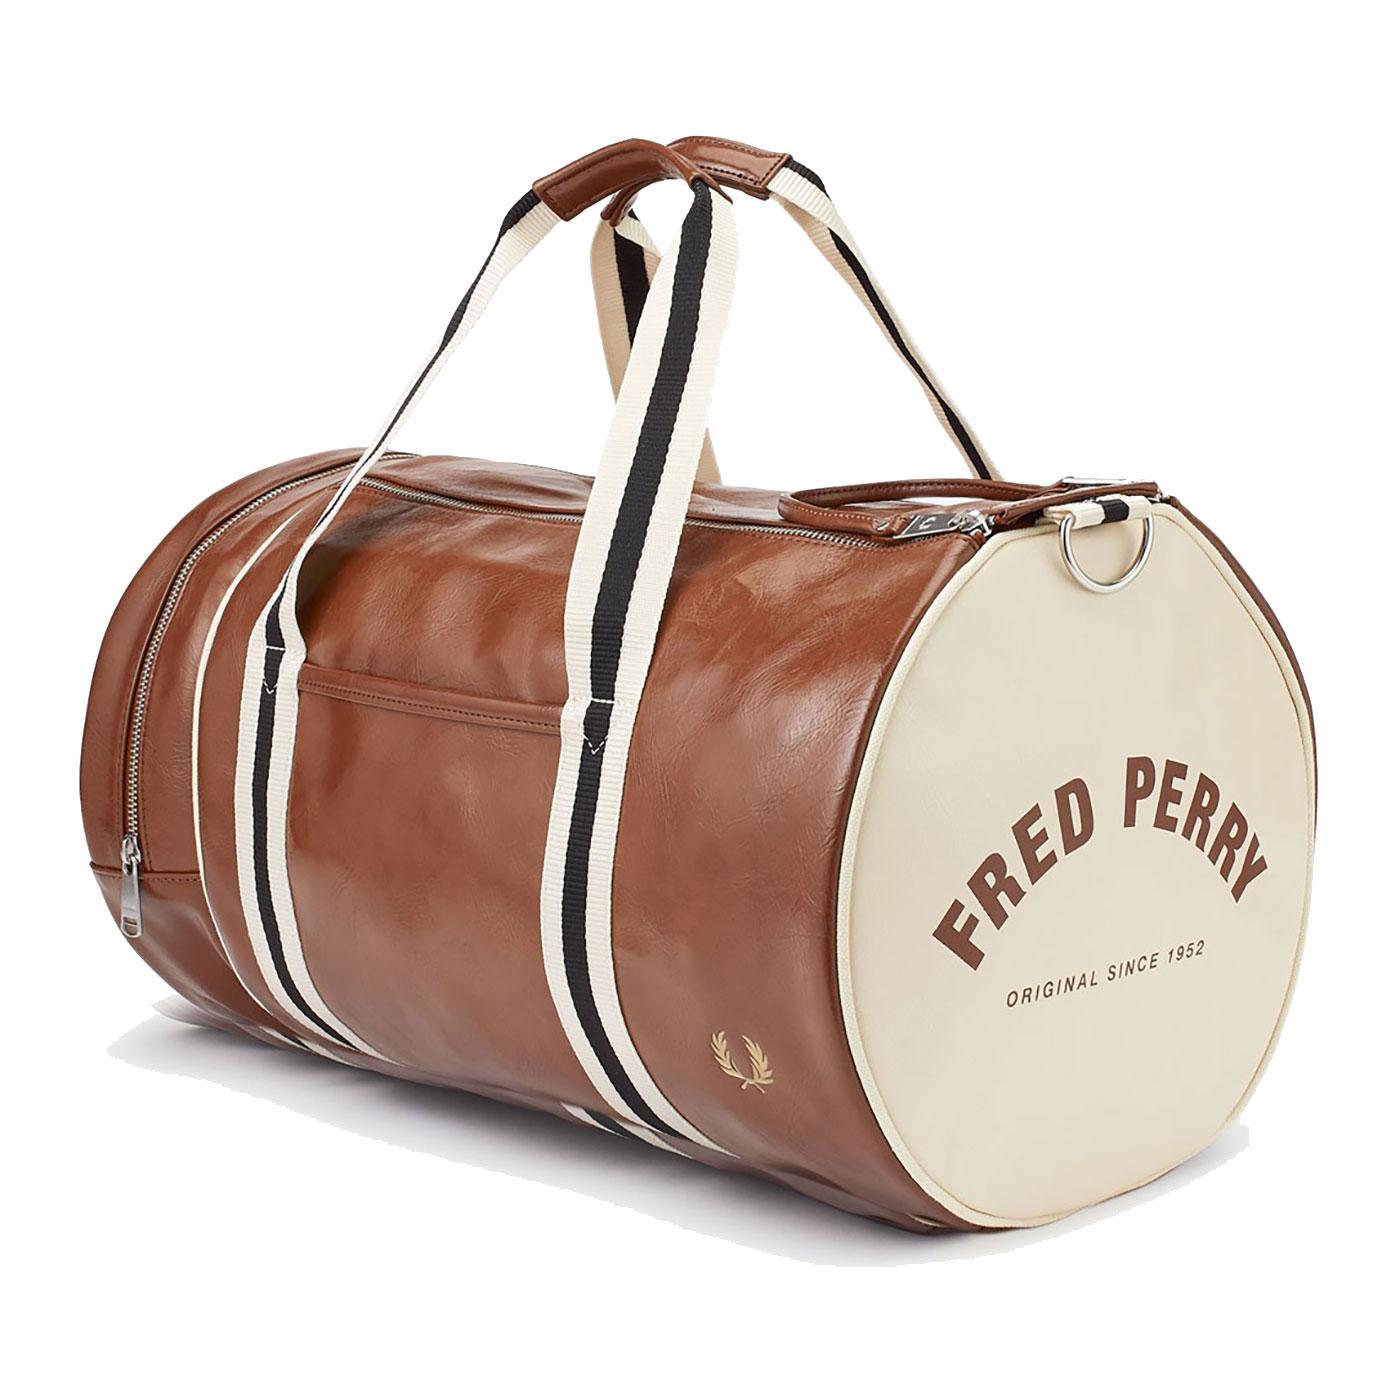 FRED PERRY Retro Mod Classic Barrel Bag - Tan/Ecru